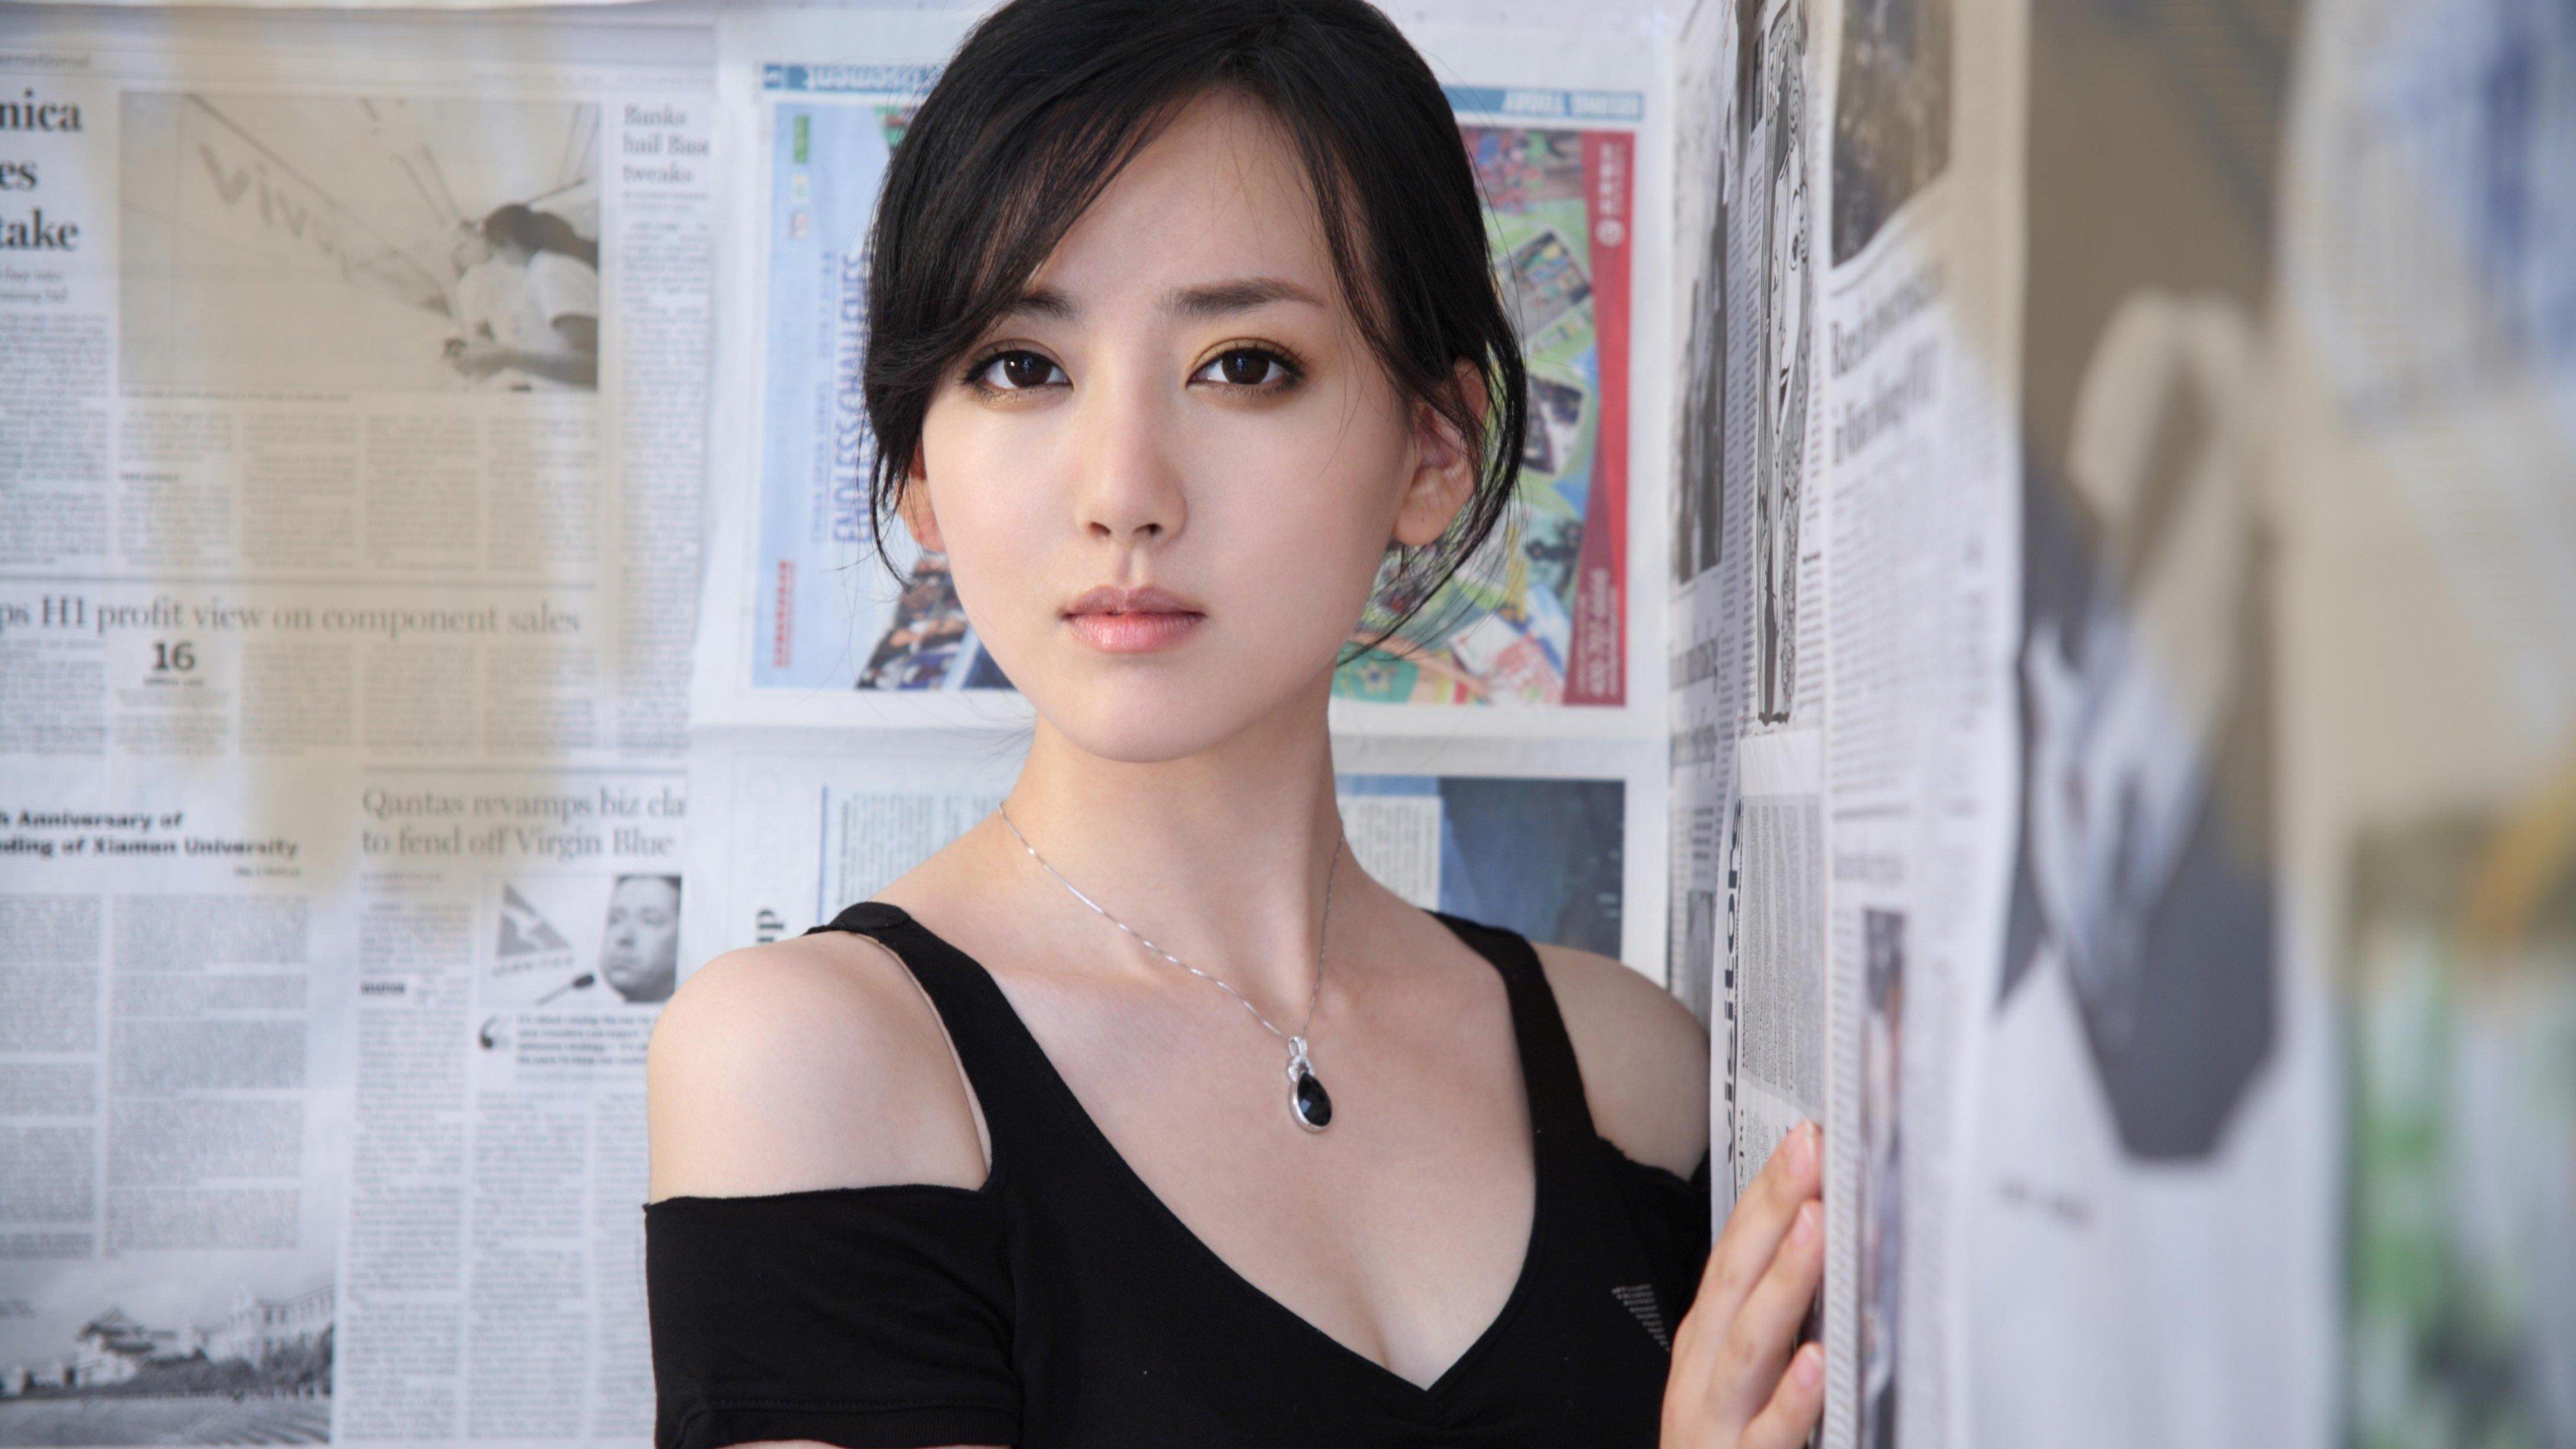 Fondos de pantalla Tian Jing actriz